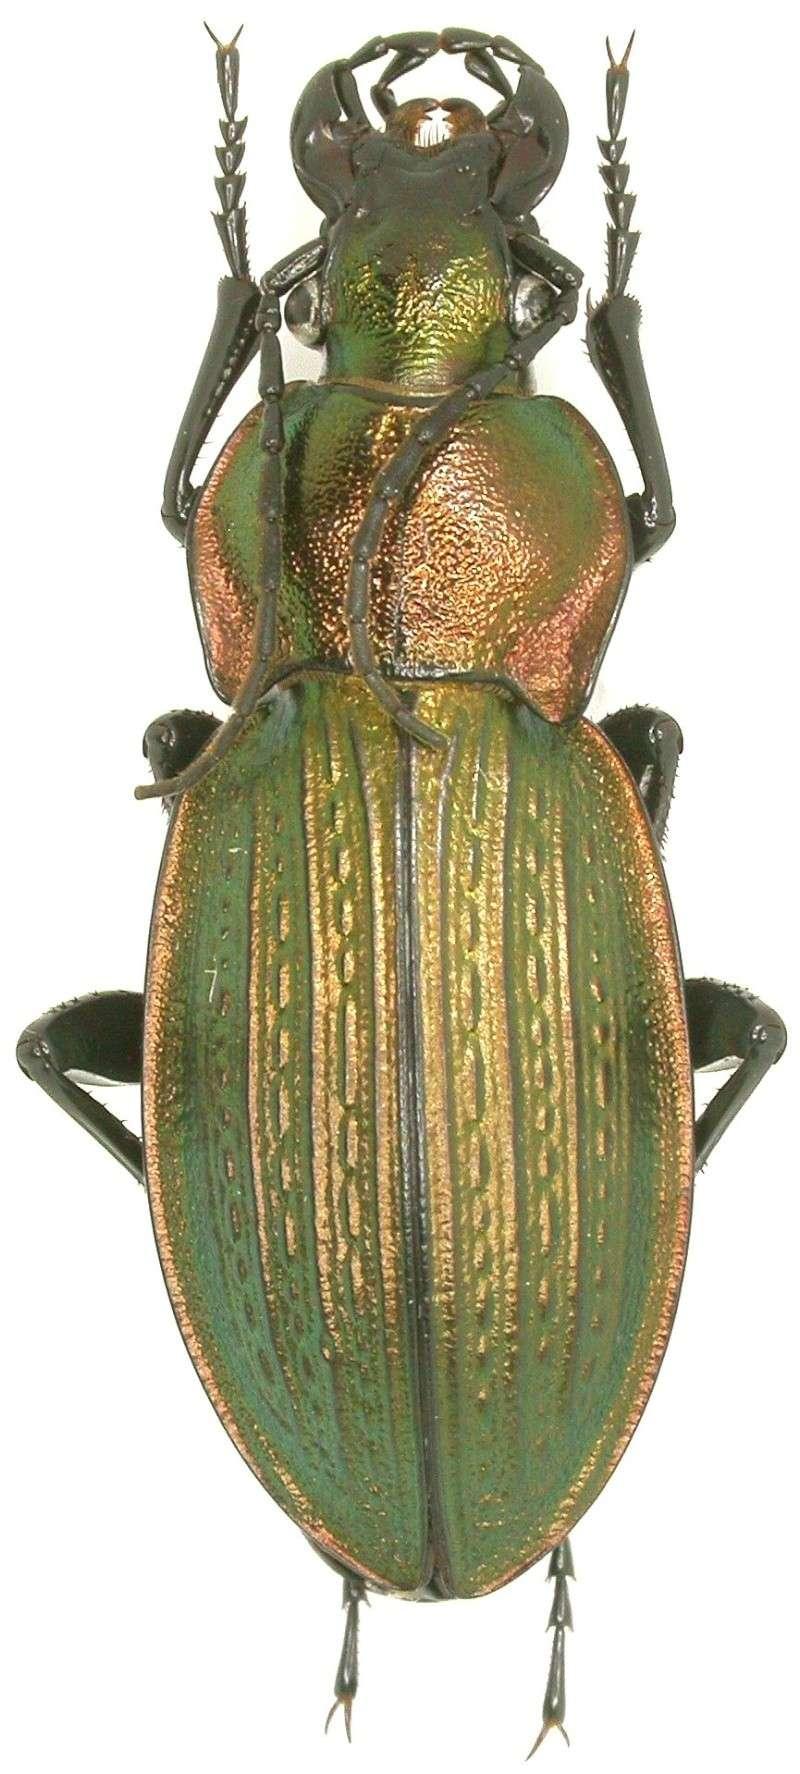 [C.(Morphocarabus) monilis interpositus] Episy F-77 Dscn0210